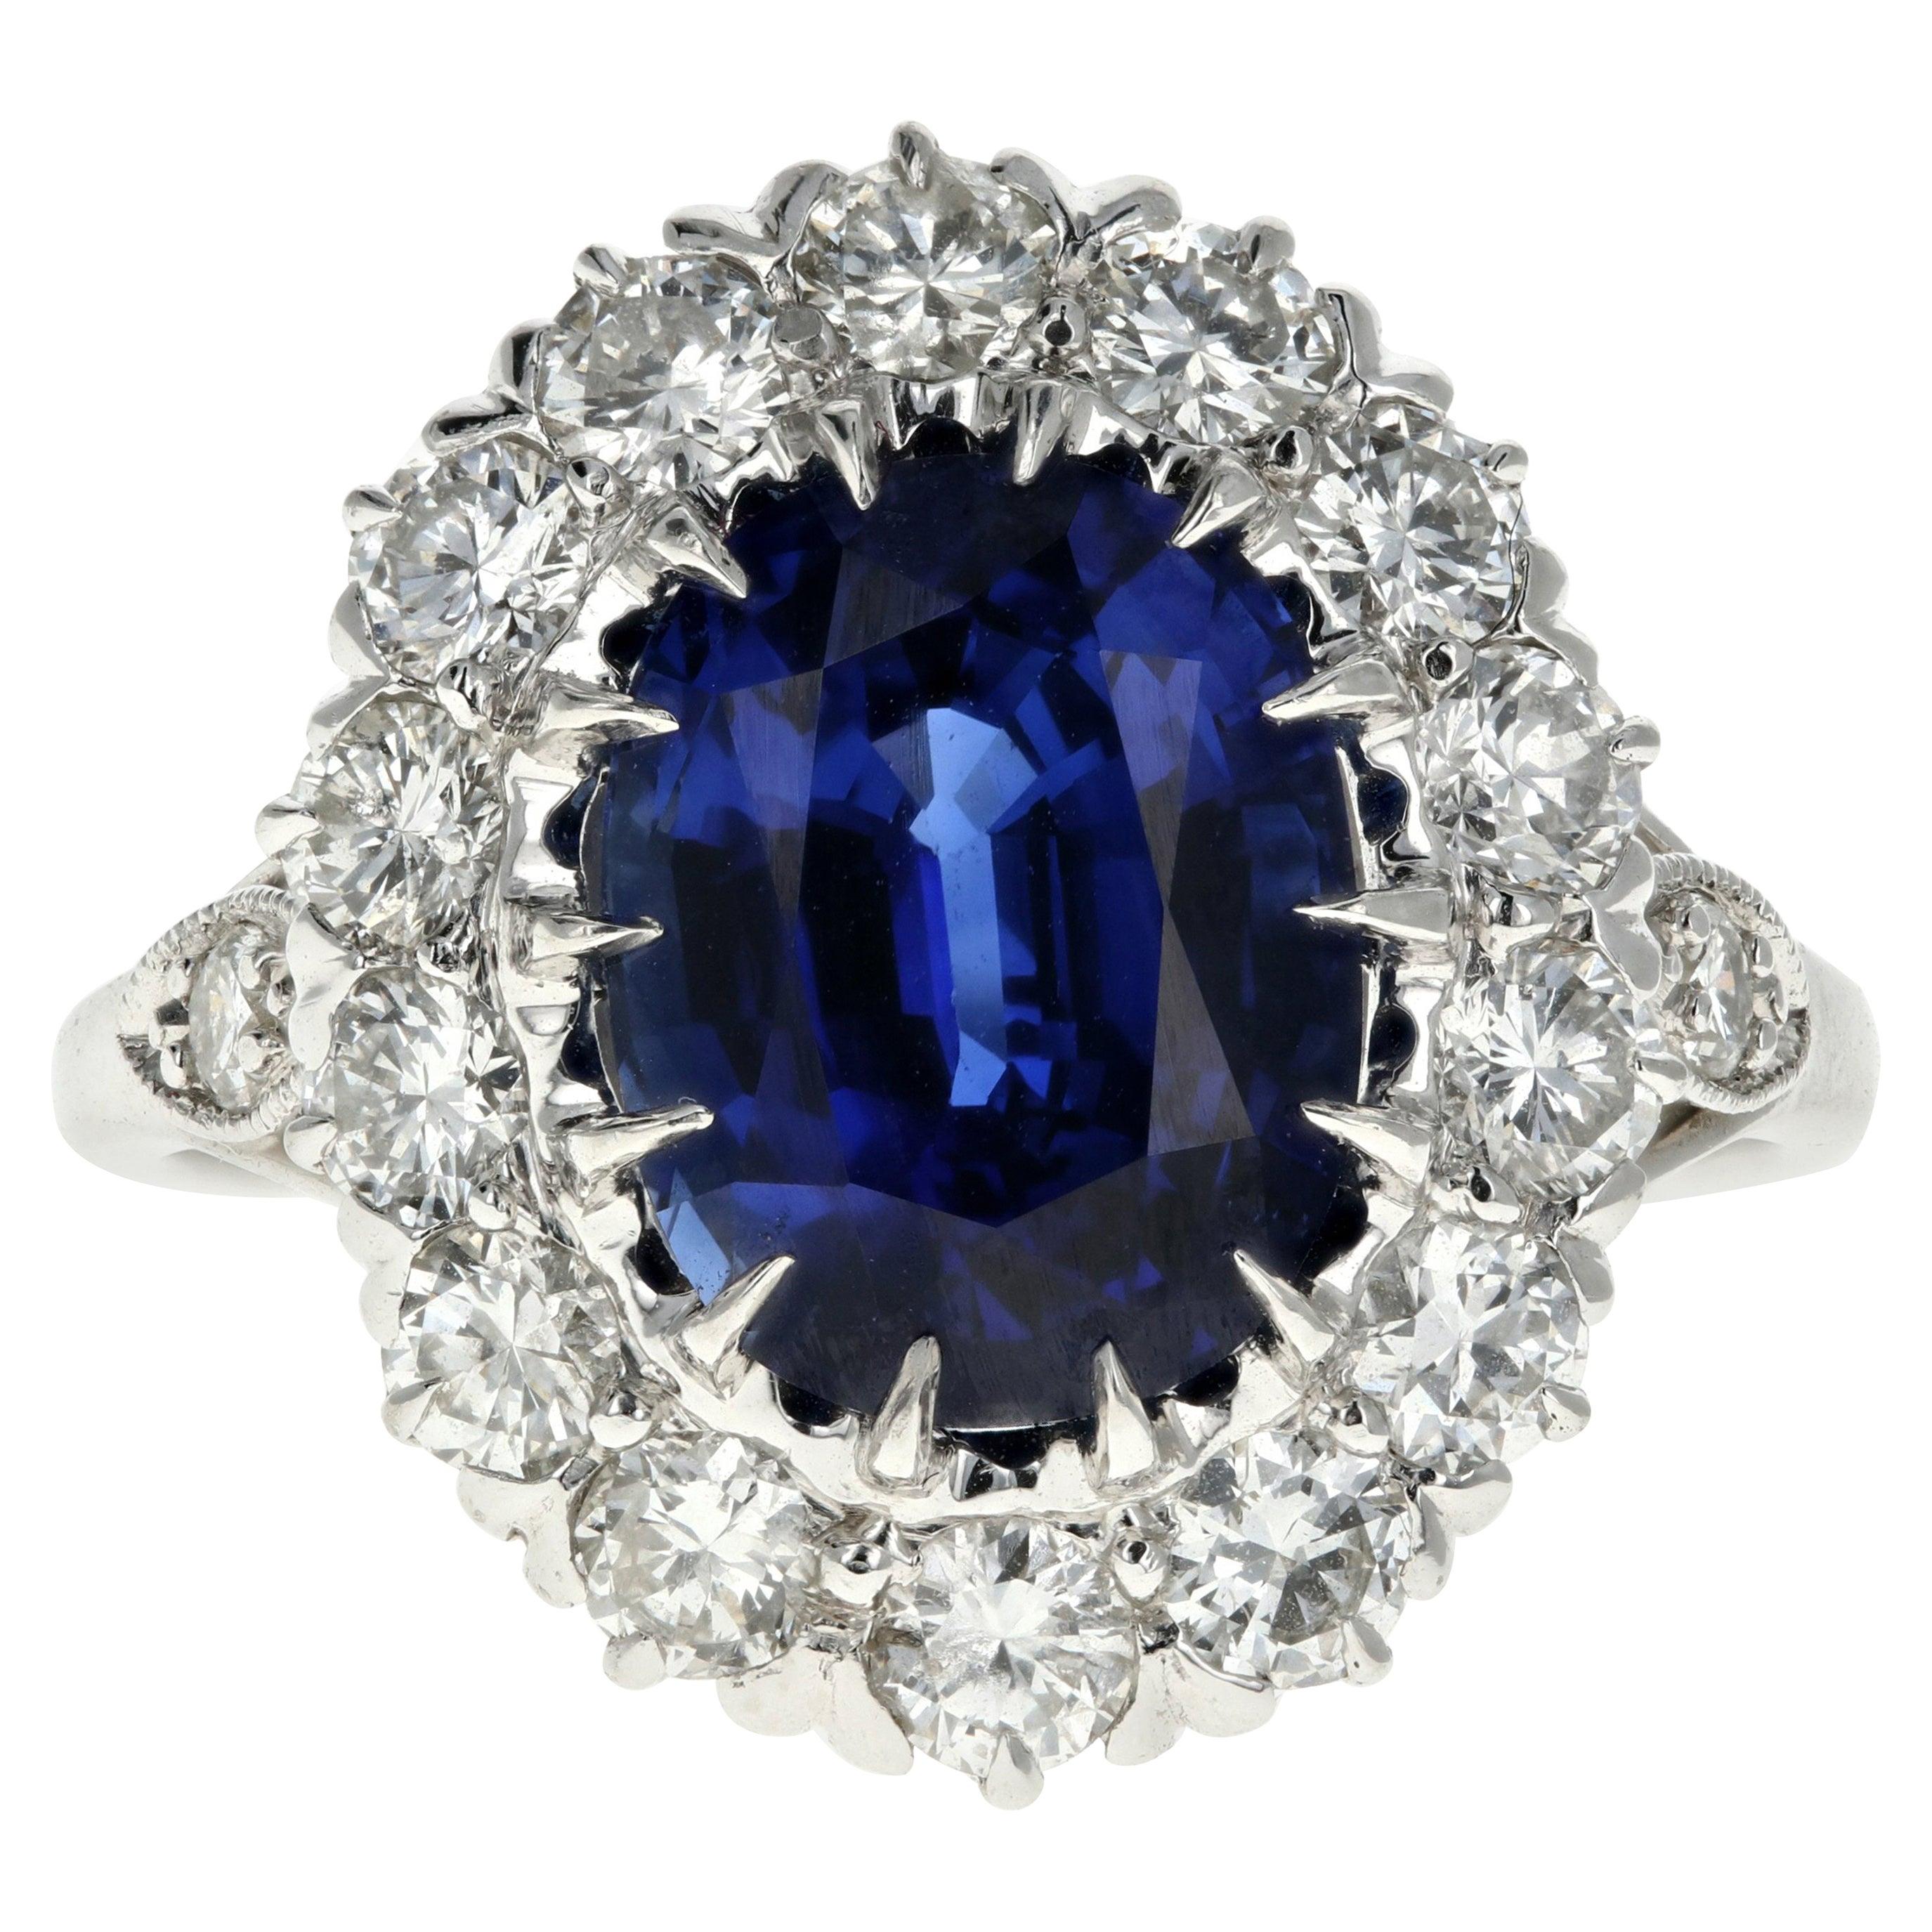 Platinum Royal Blue Madagascar Sapphire and Diamond Ring GIA Certified